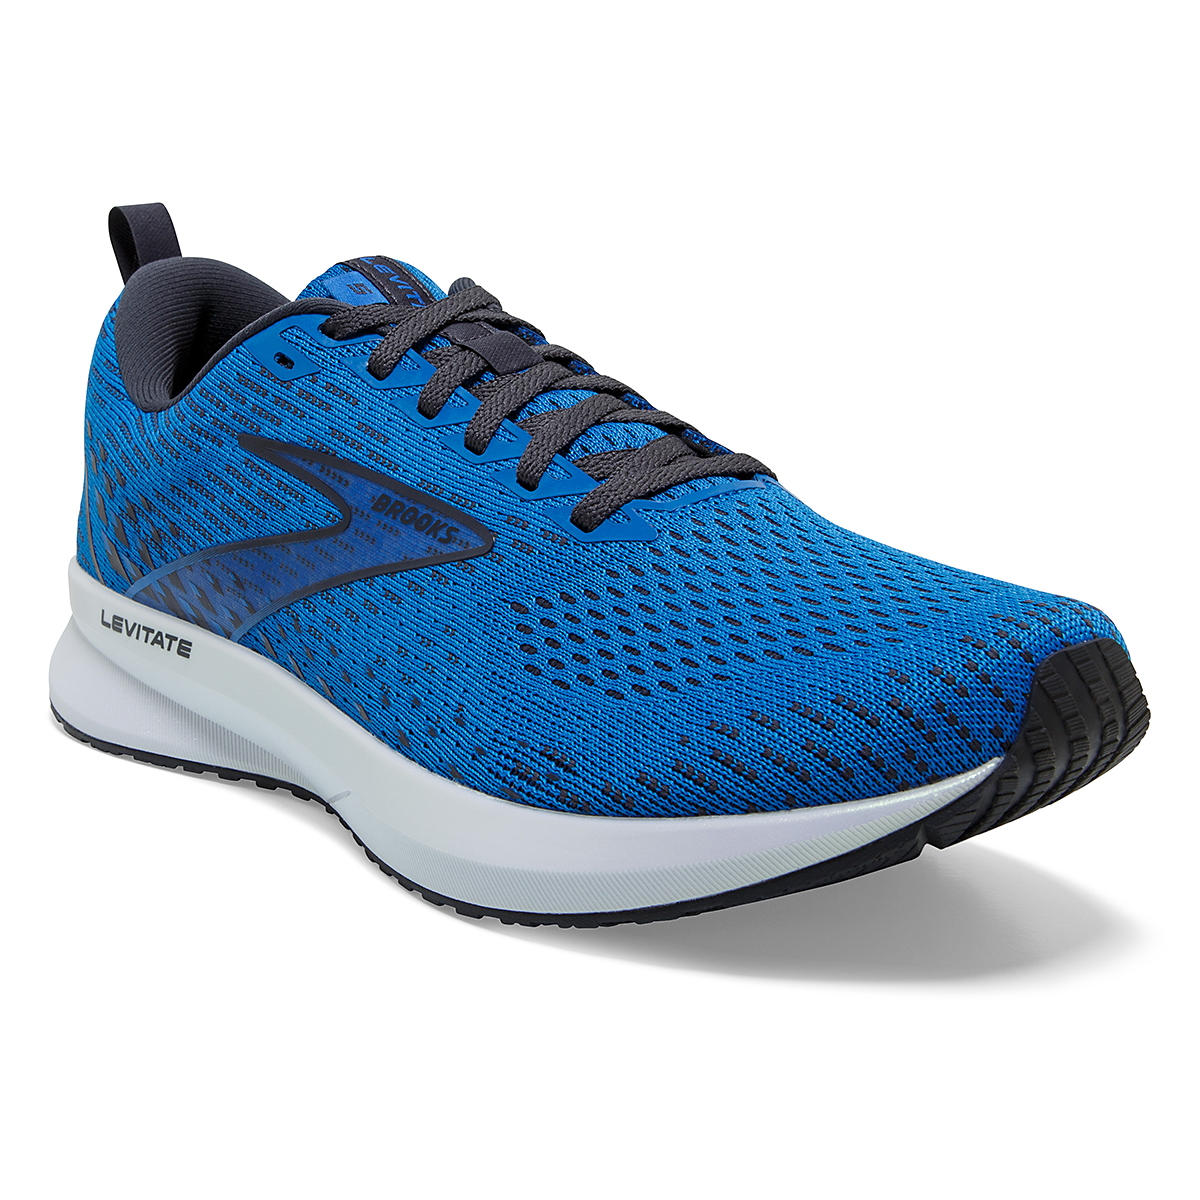 Men's Brooks Levitate 5 Running Shoe - Color: Blue/India Ink/White - Size: 7 - Width: Regular, Blue/India Ink/White, large, image 2